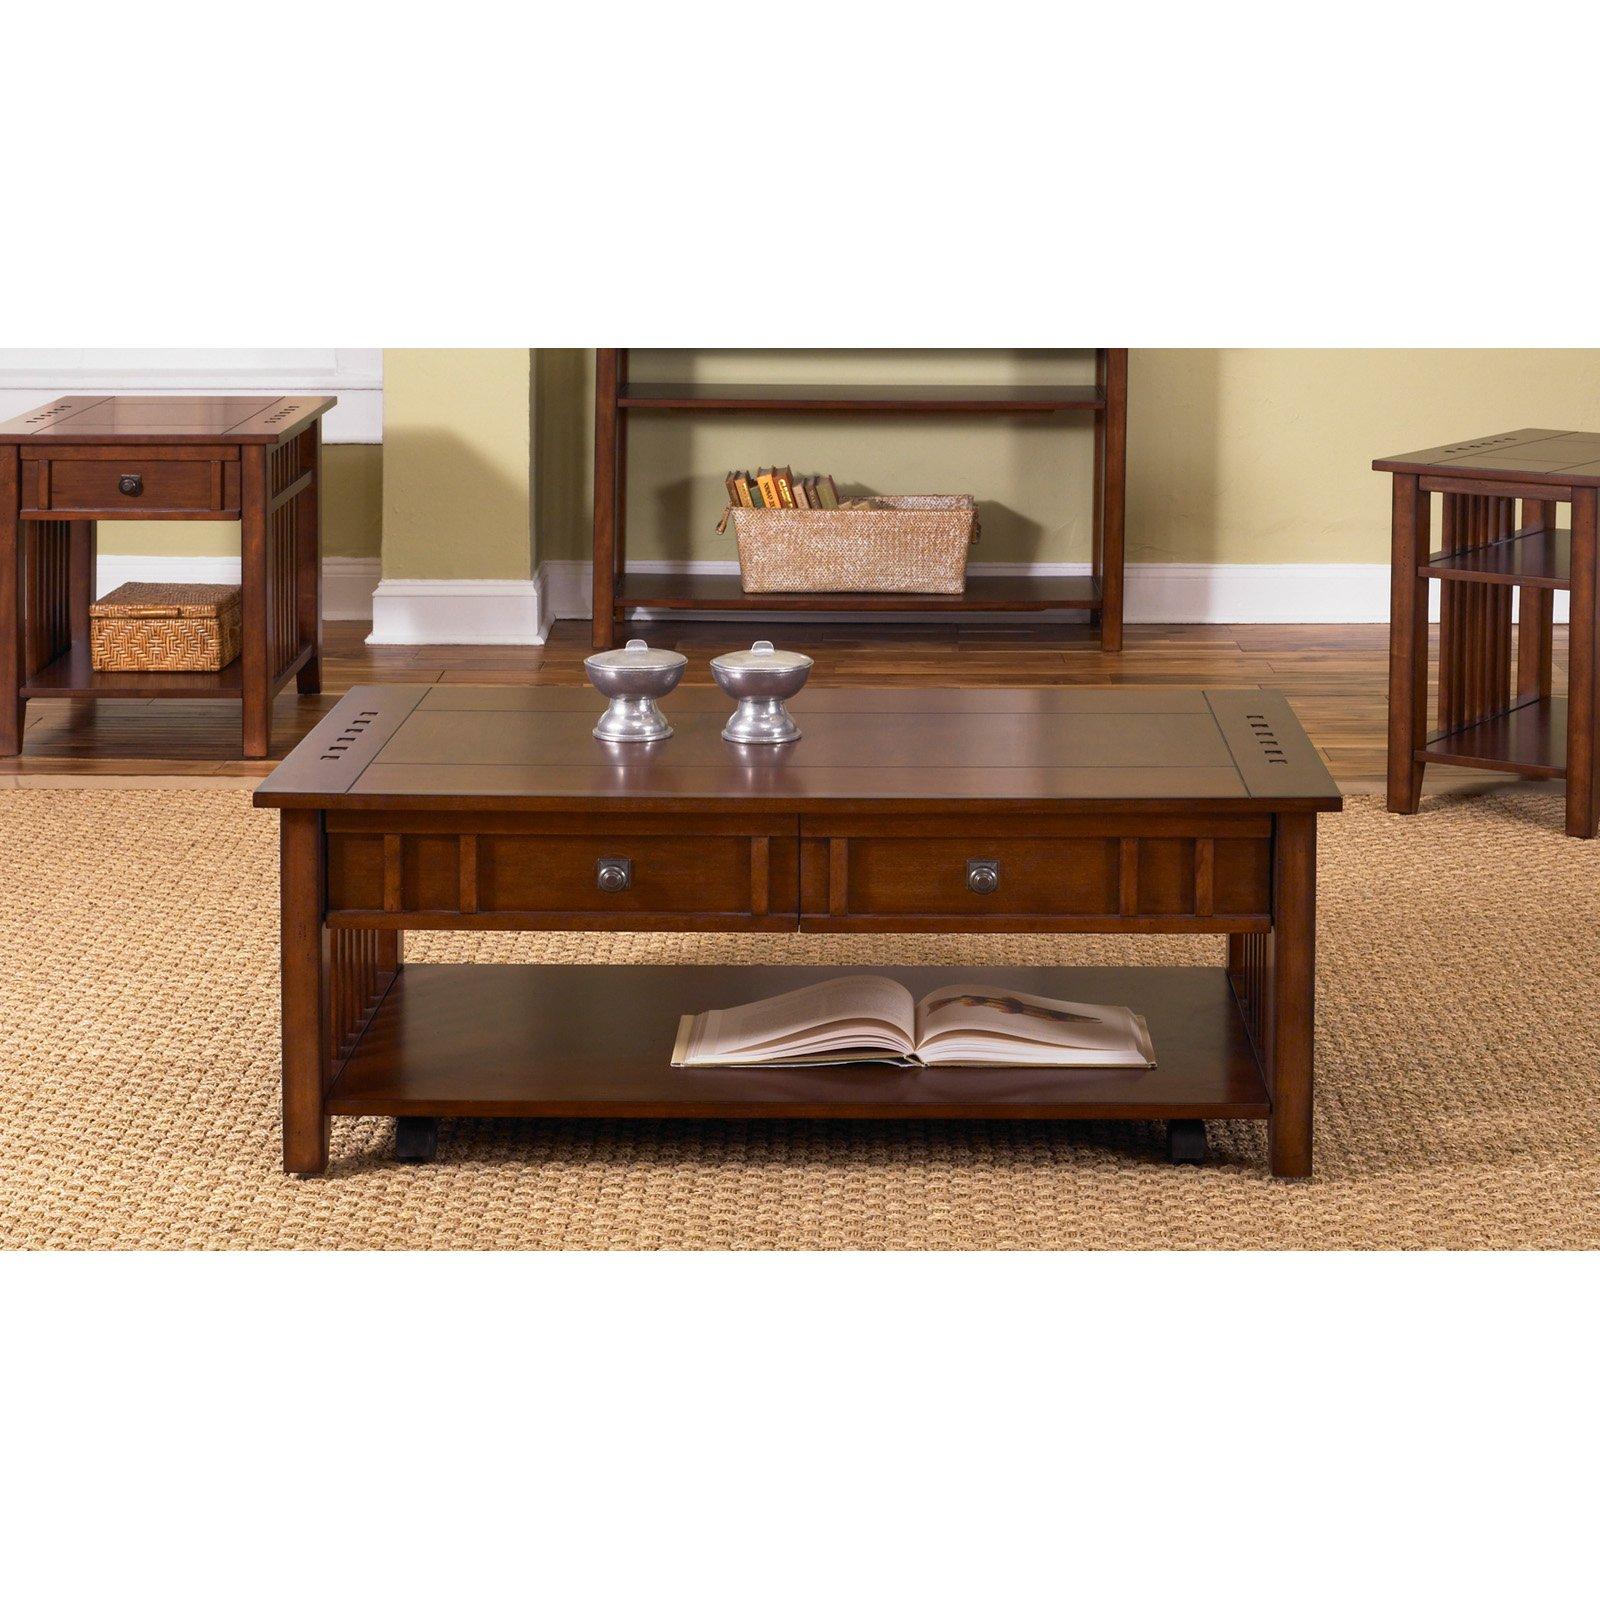 Prairie Hills Rectangular Coffee Table With Drawers Satin Cherry